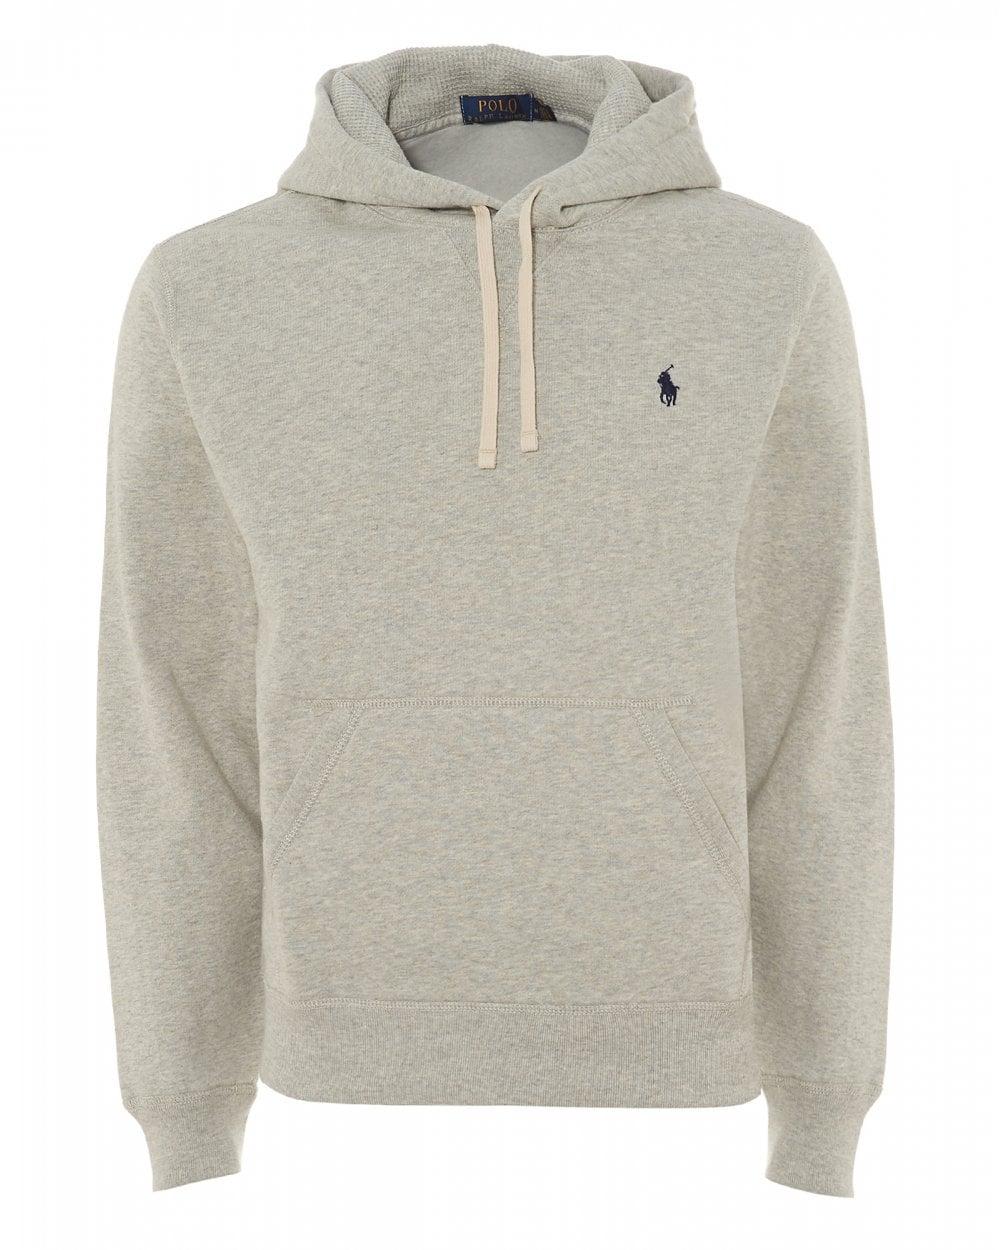 pretty nice c50e7 06323 Mens Side Pocket Hoodie, Lt Sport Heather Grey Sweatshirt